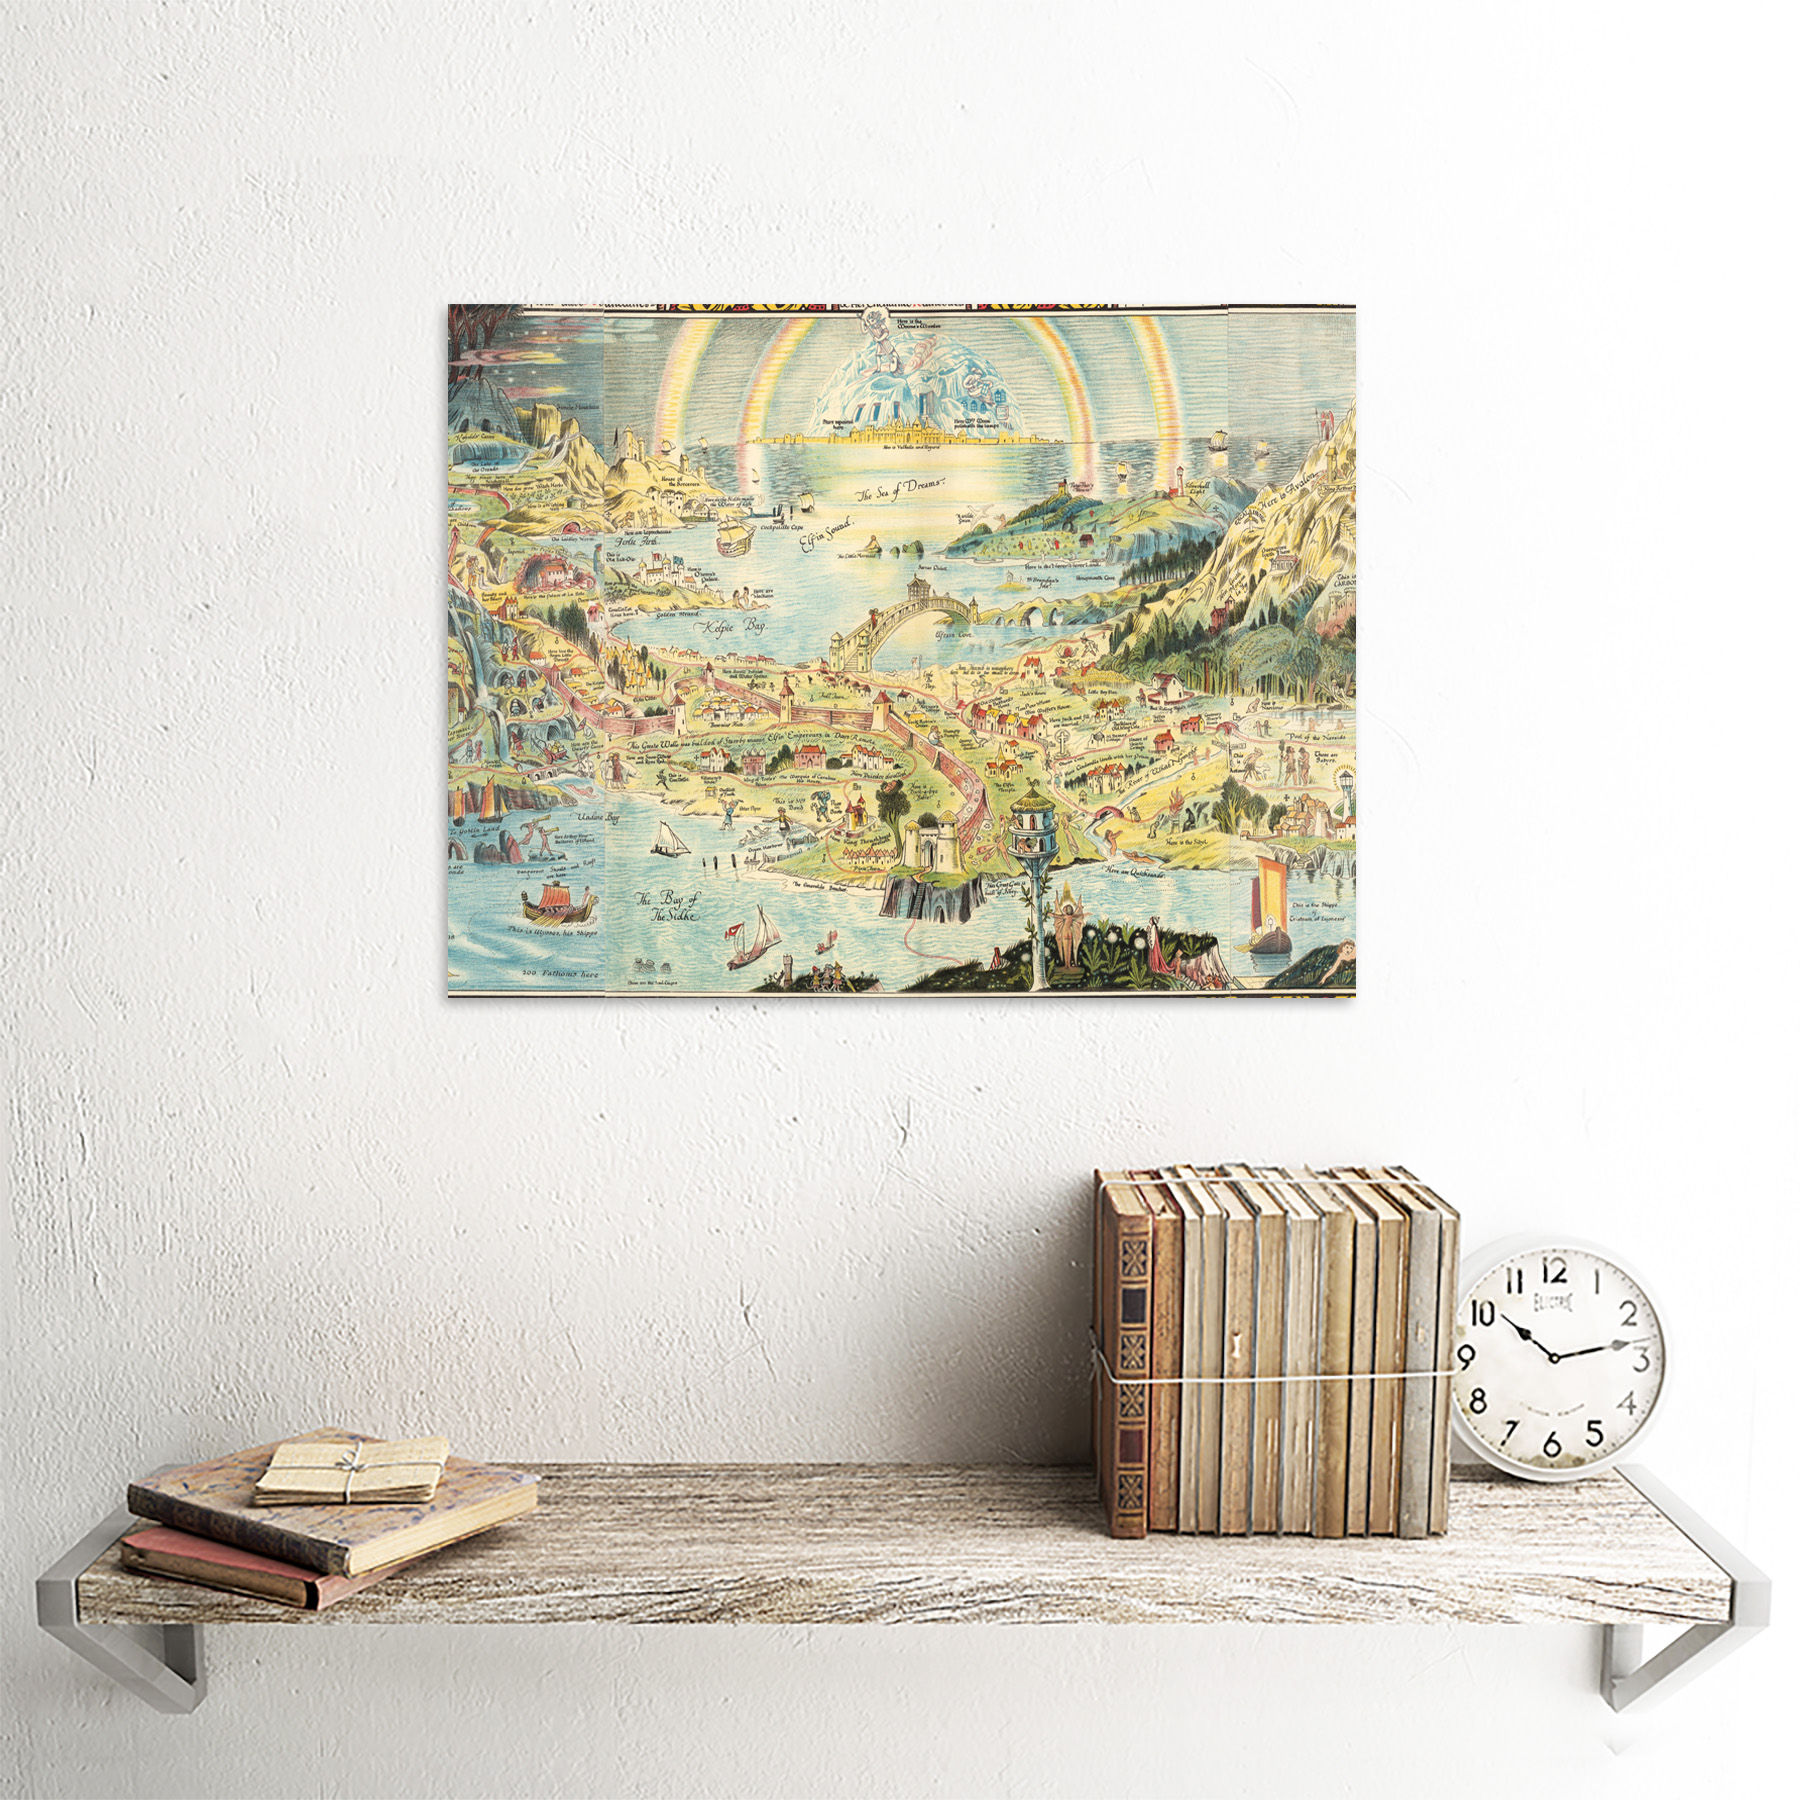 thumbnail 27 - Map-Sleigh-1918-Ancient-Fairyland-Fantasy-Chart-Wall-Art-Print-Framed-12x16